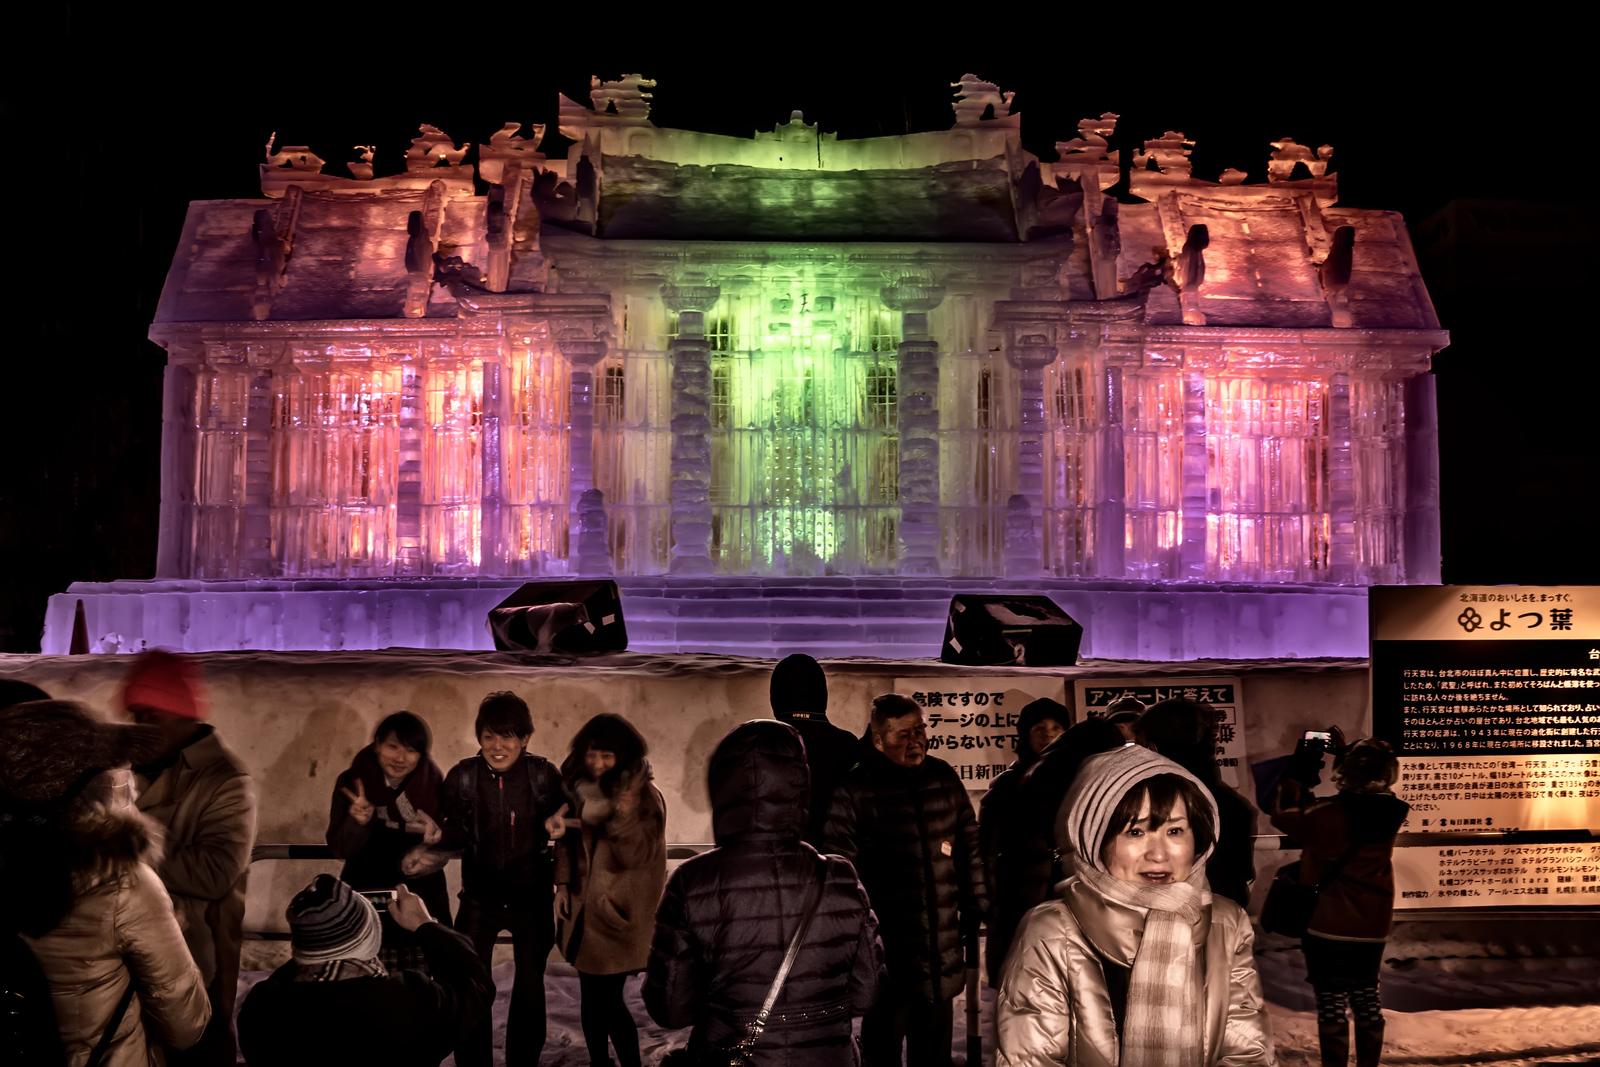 yukimatsuri,winter festival,travel,explore,hokkaido,japan,photography